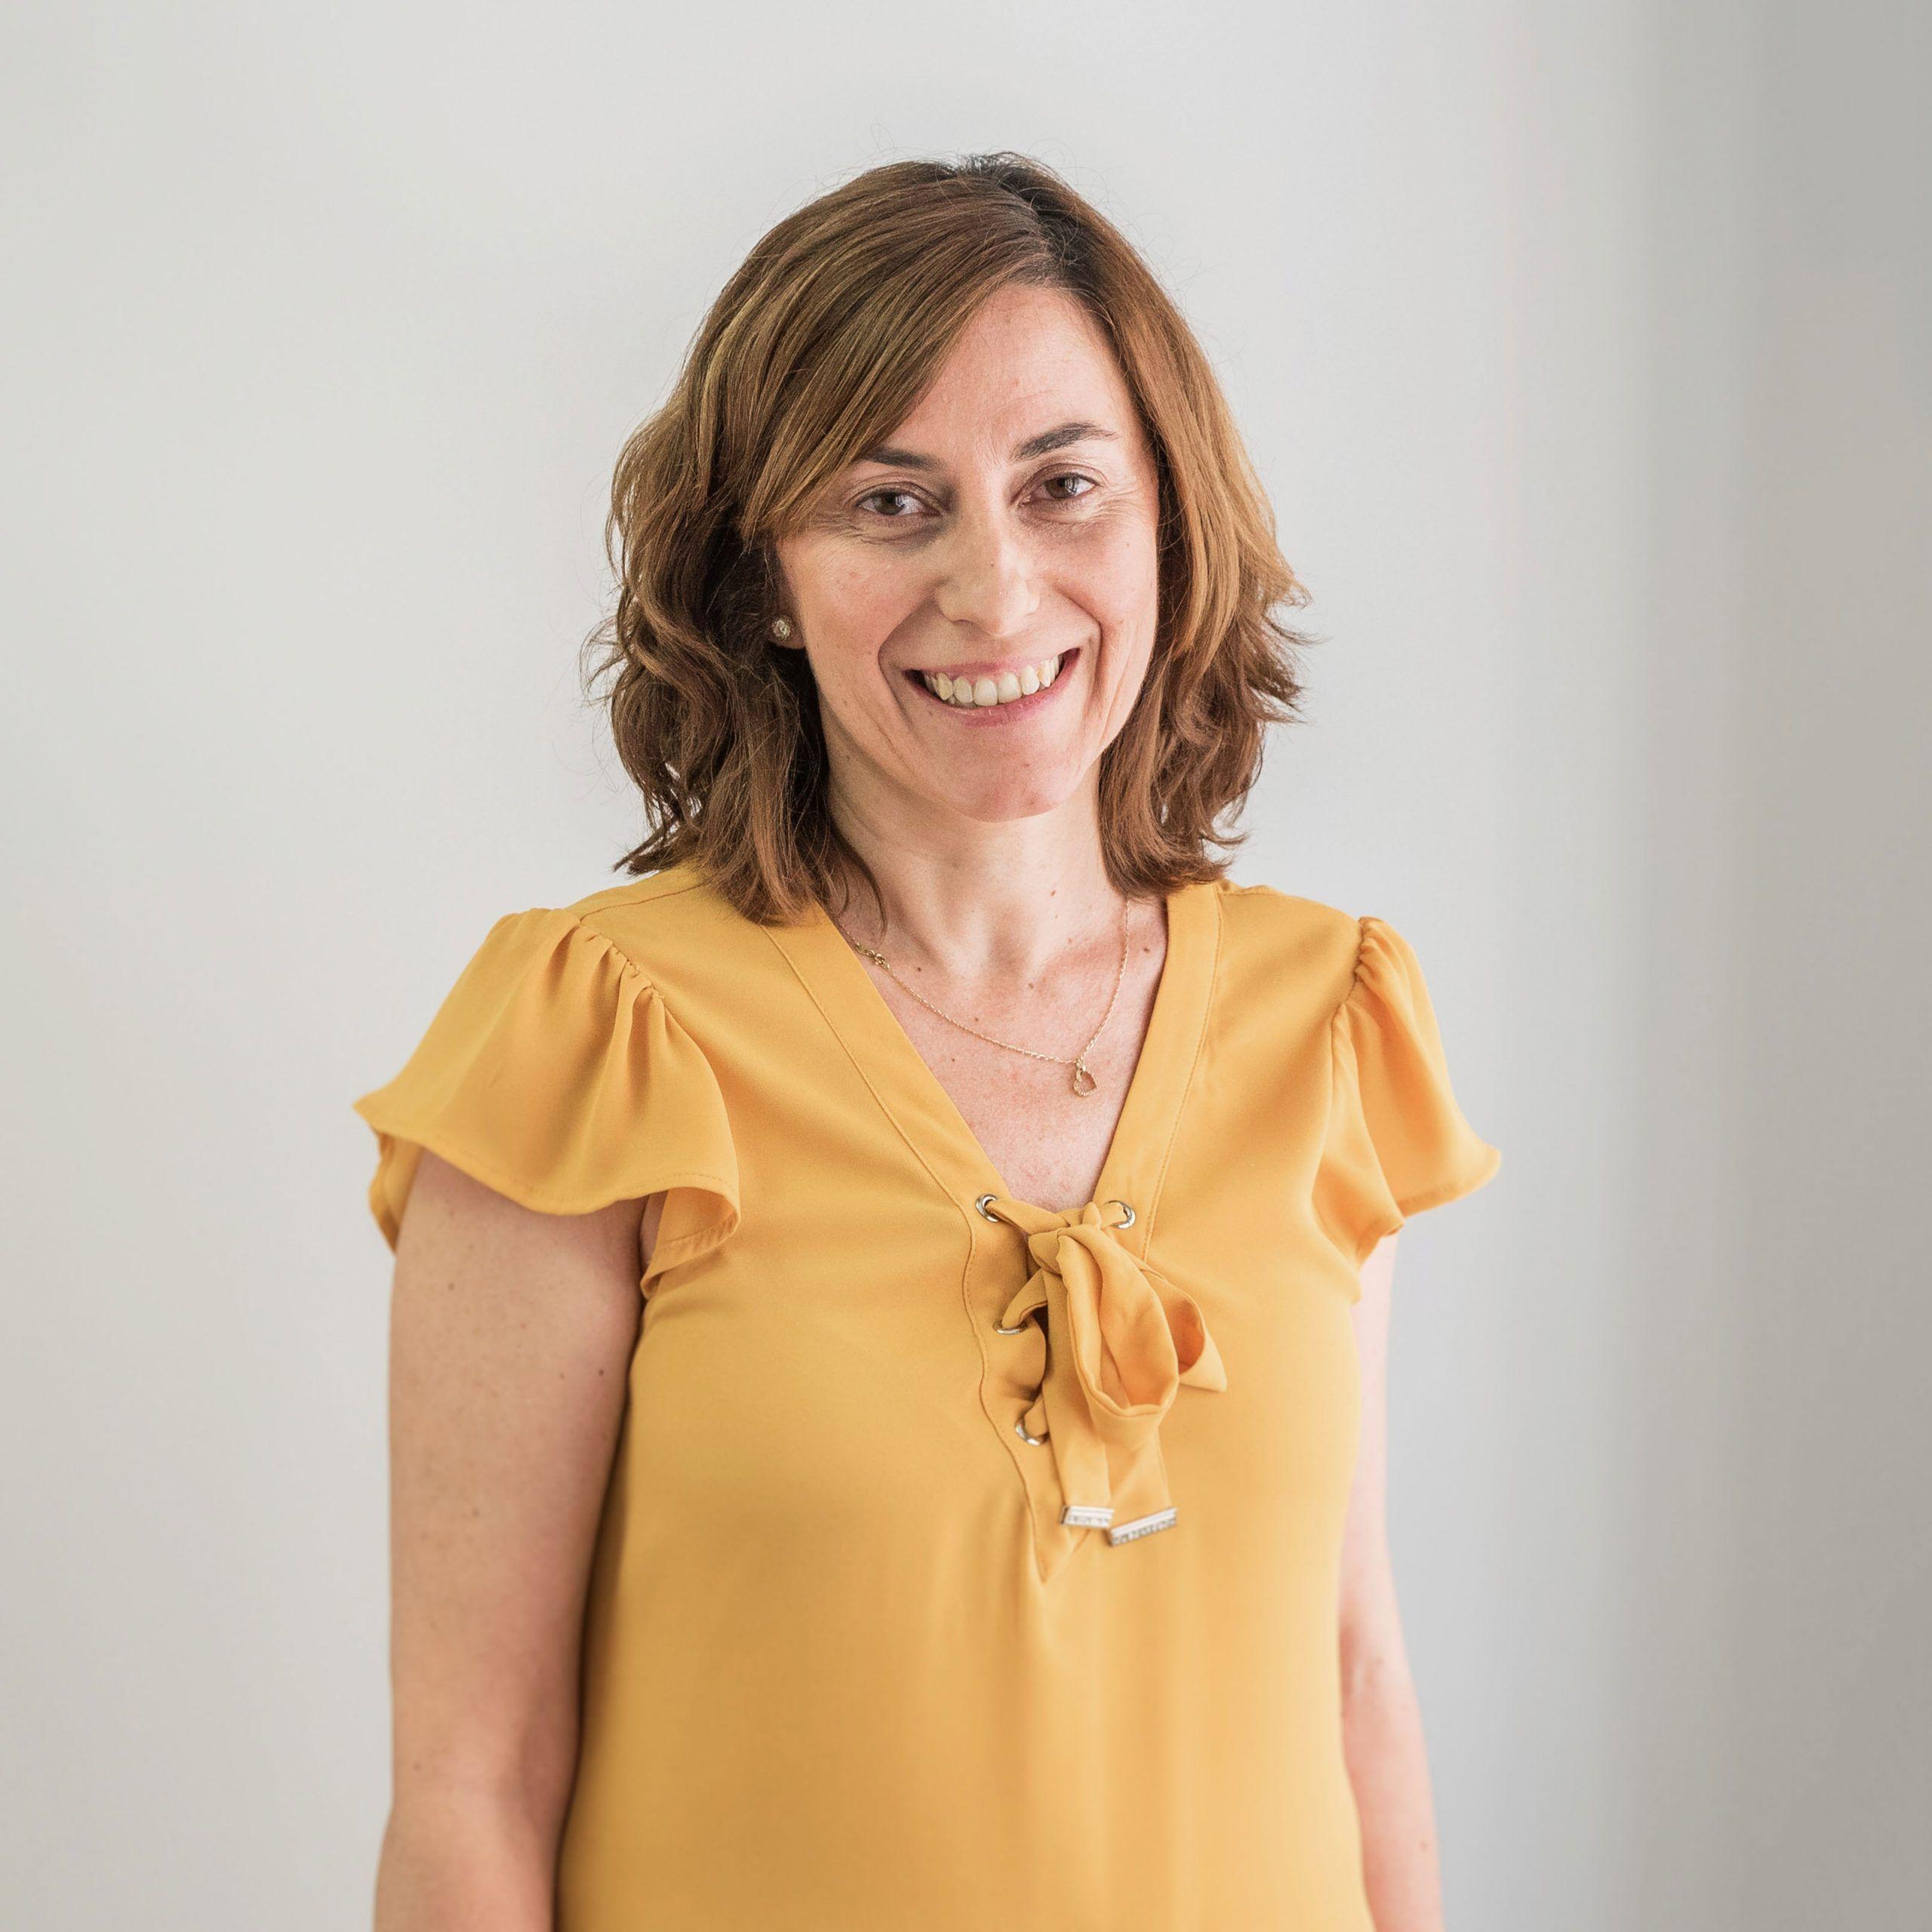 Susana García Martínez